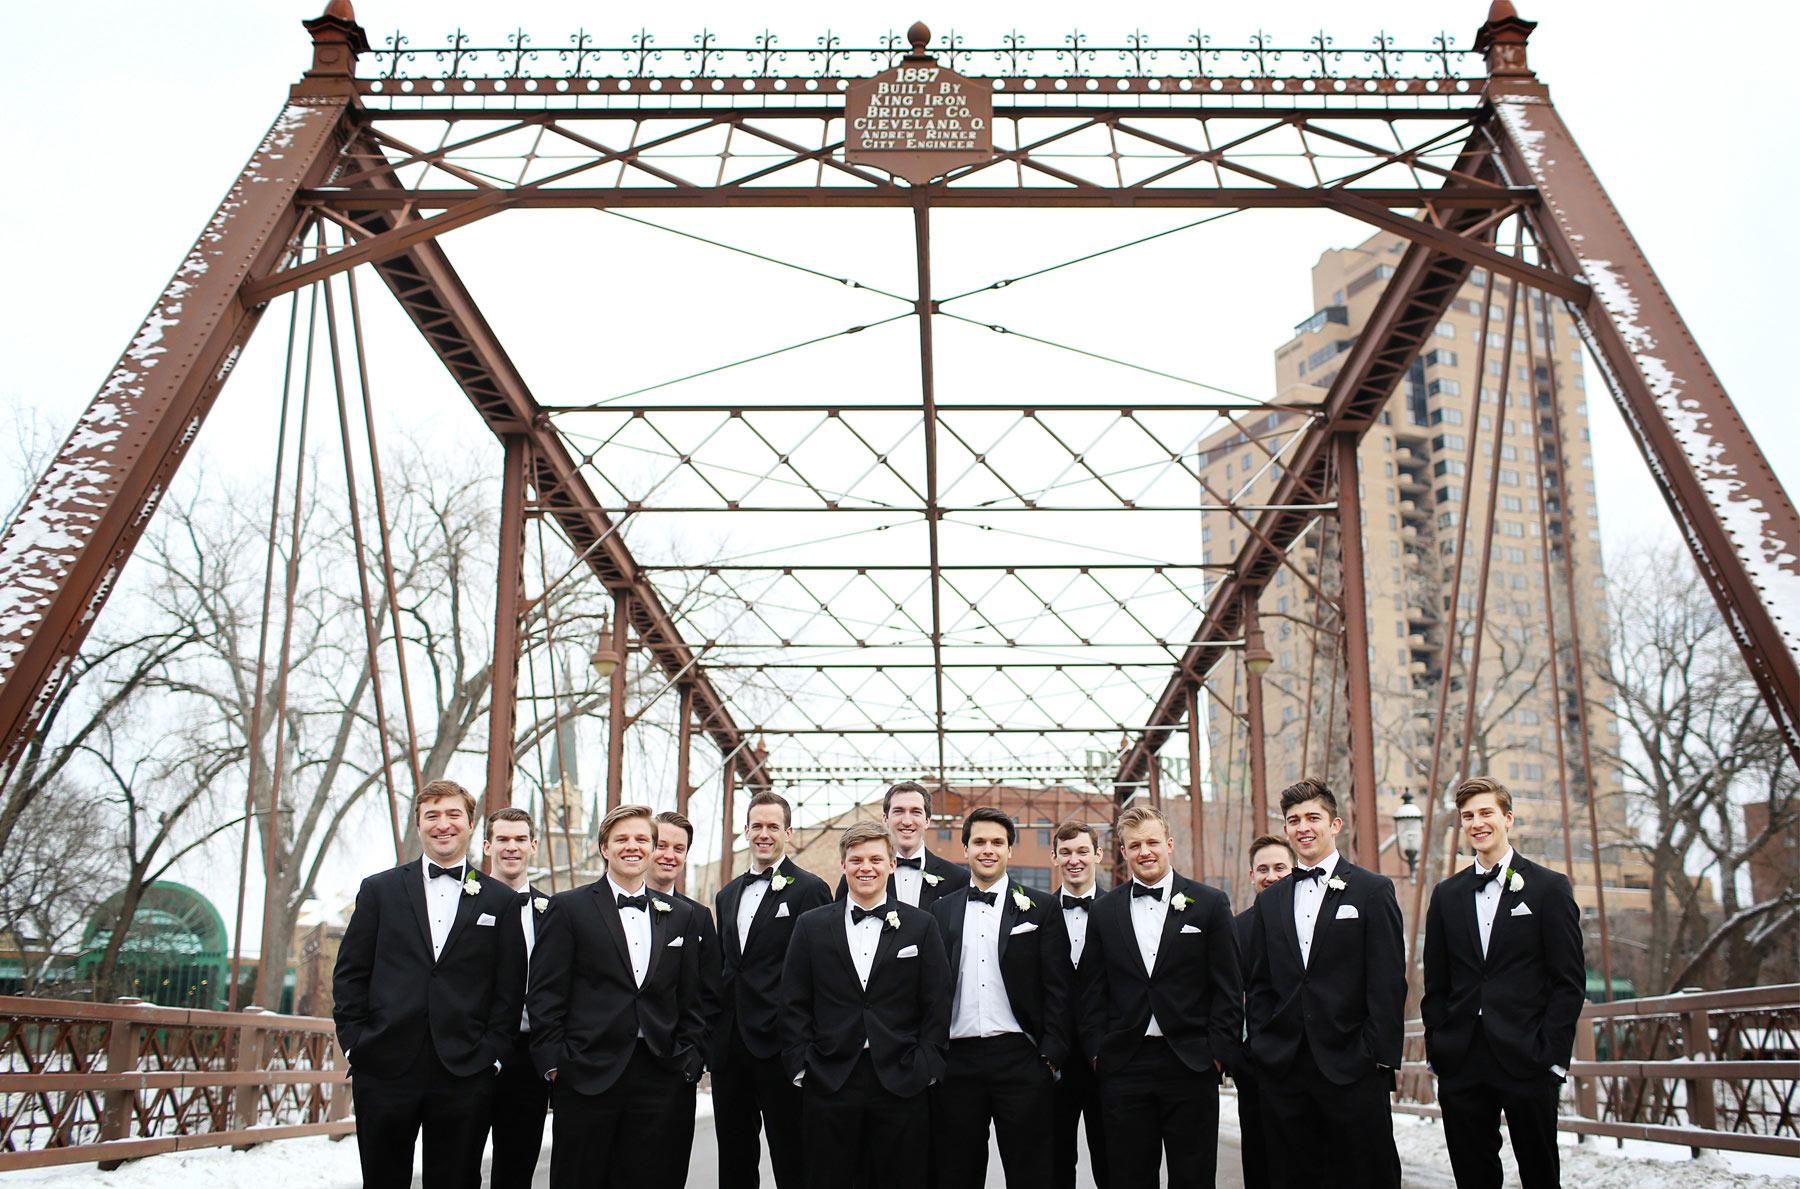 10-Minneapolis-Minnesota-Wedding-Photography-by-Vick-Photography-Downtown-Winter-Groomsmen-Nicollet-Island-Caroline-and-J.jpg